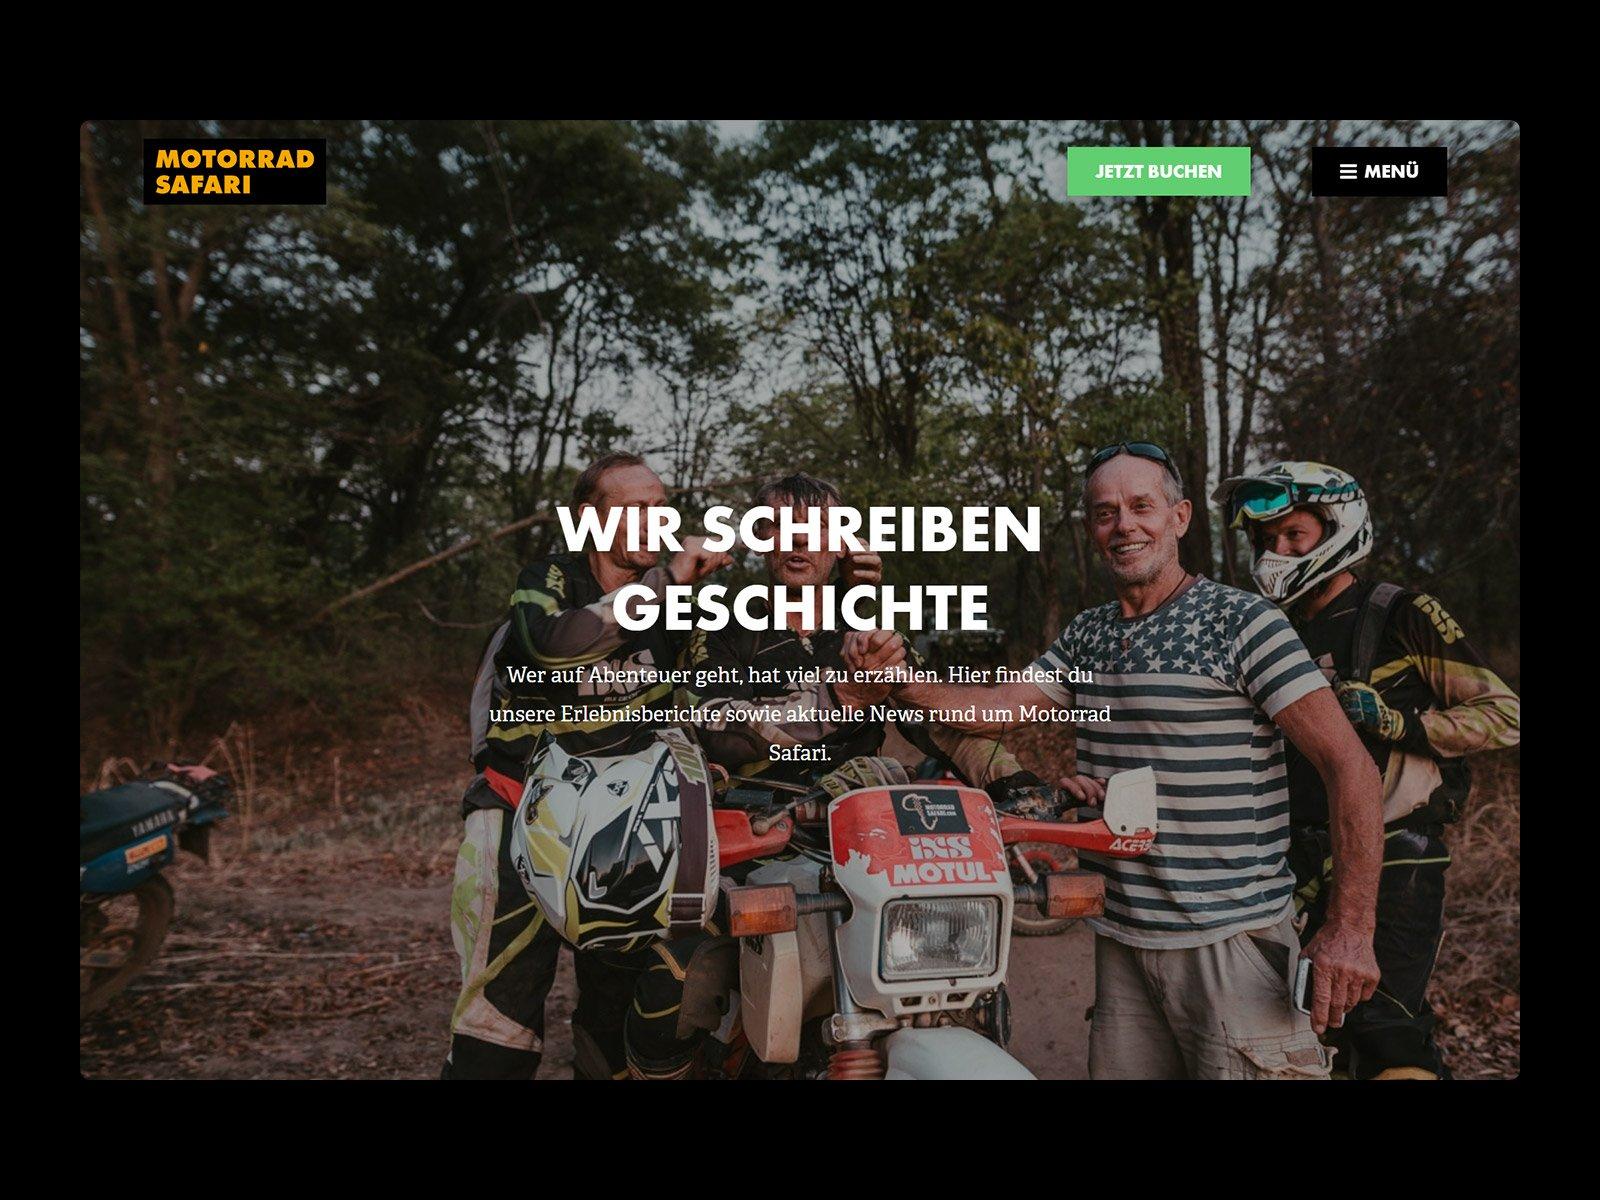 210405 Motorradsafari Project single image